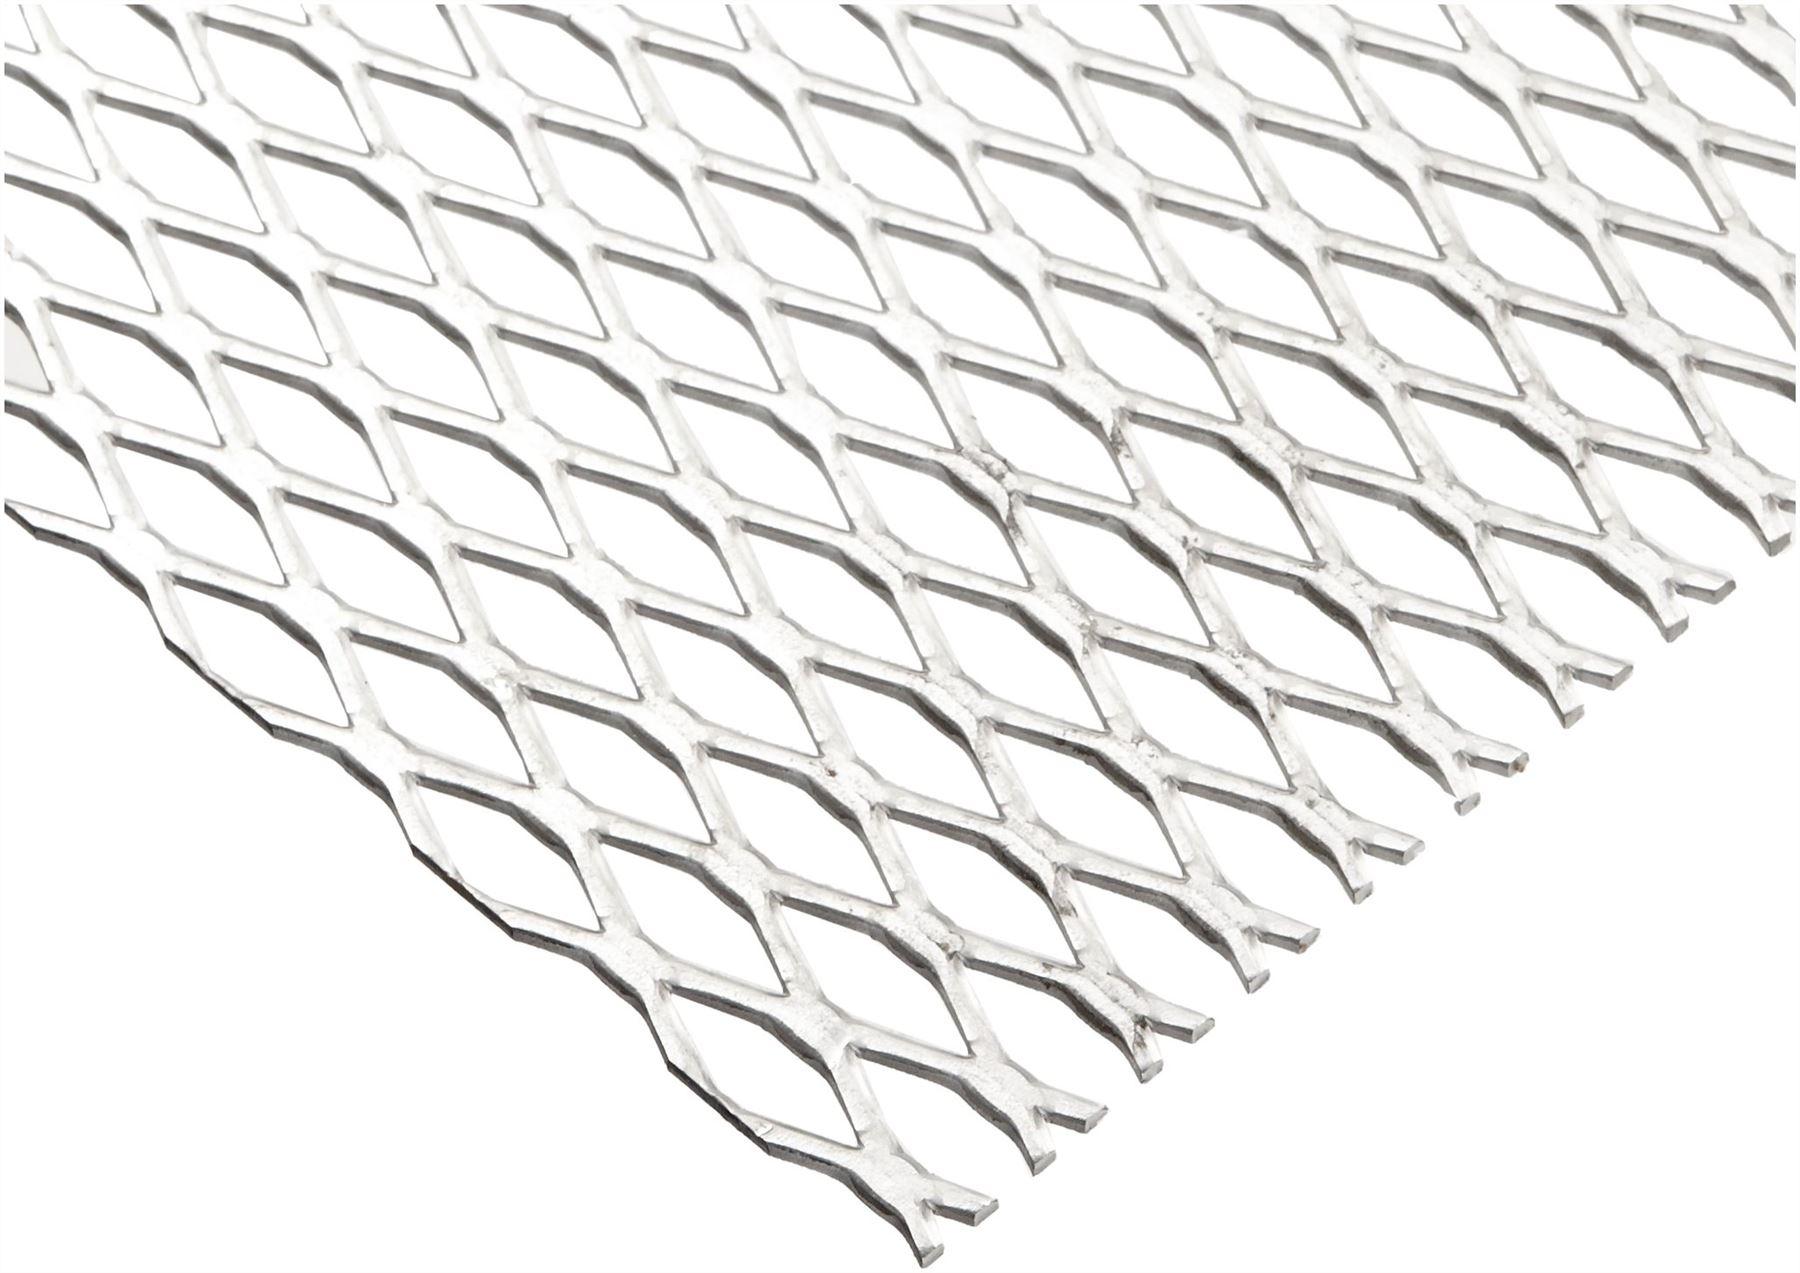 Steel Expanded Metal Galvanized Flattened Sheet 1 2 16